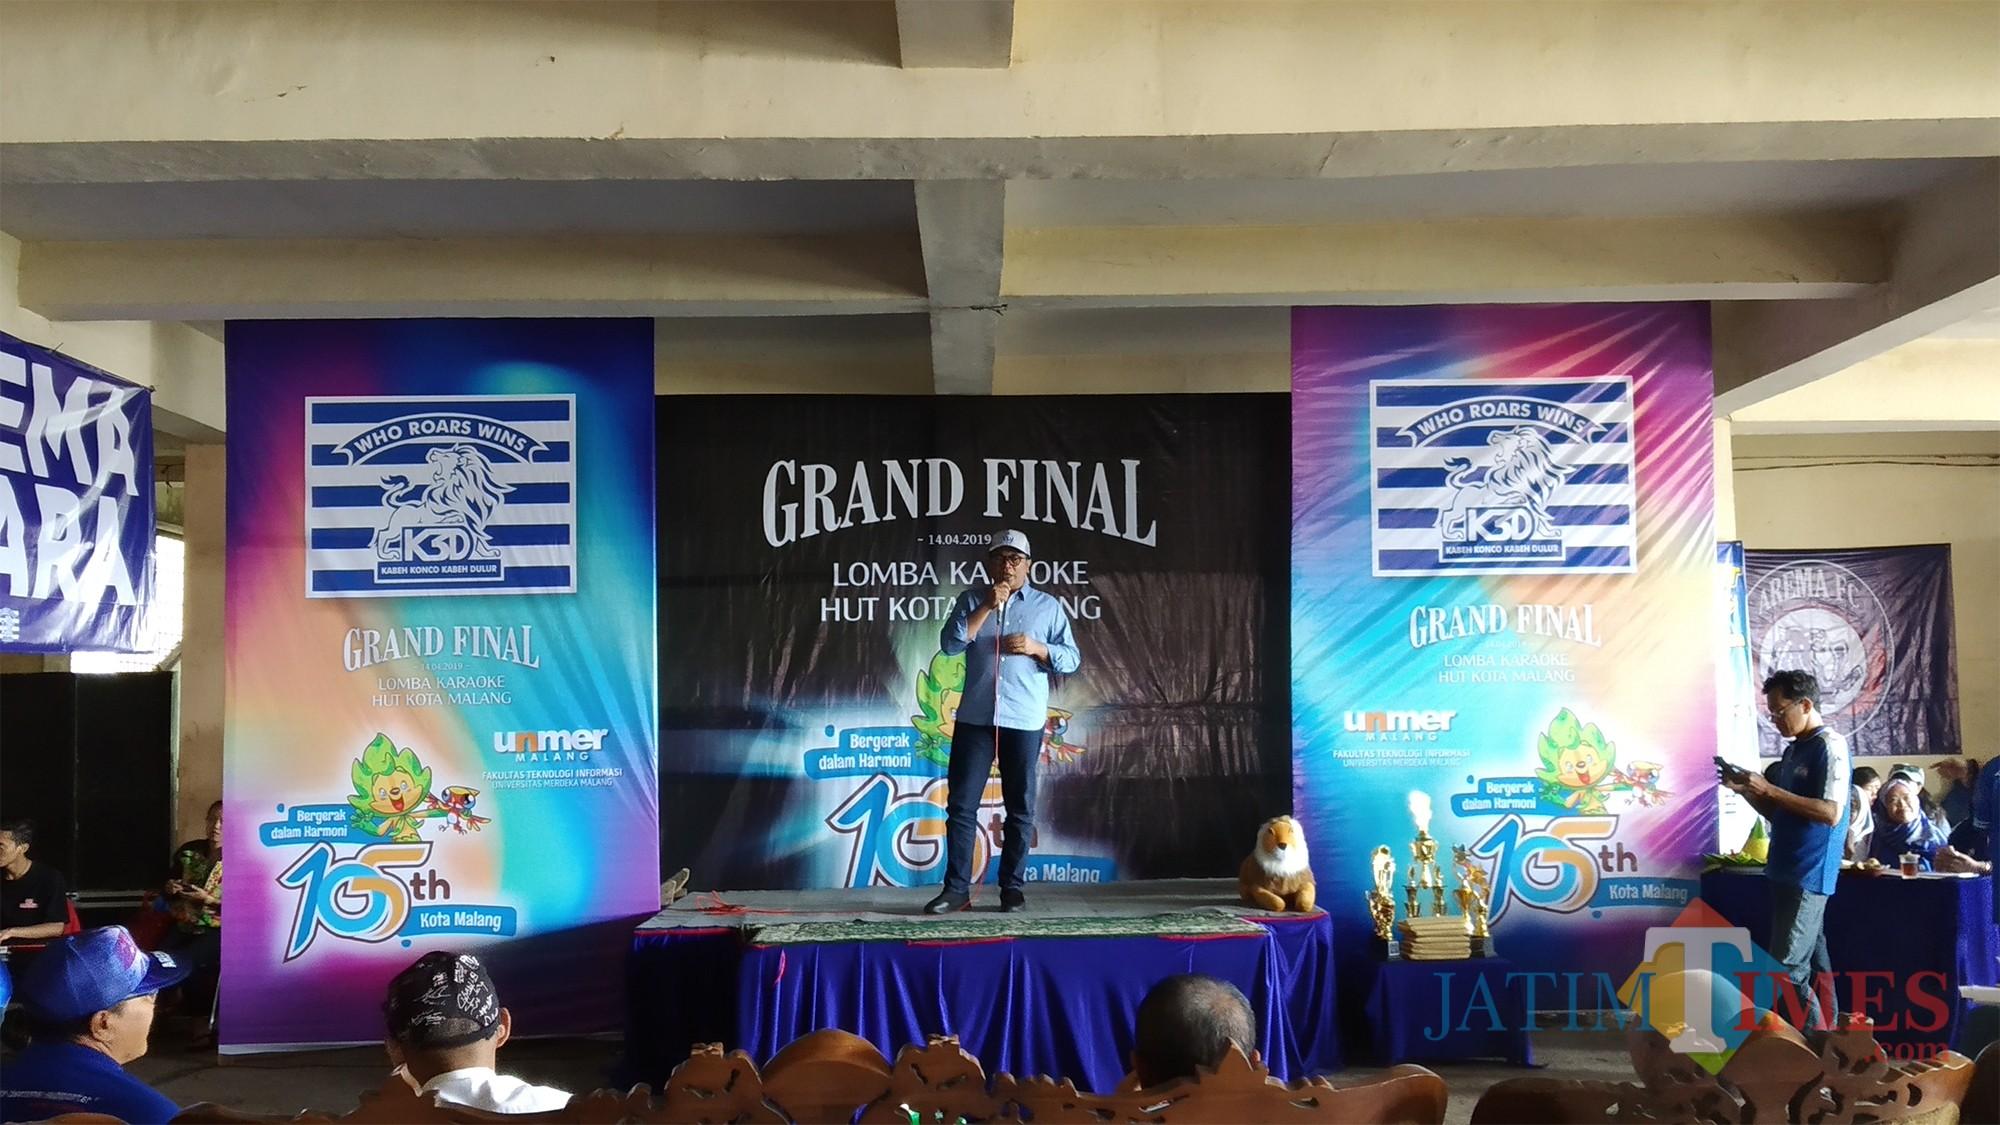 Wakil Wali Kota Malang Sofyan Edi Jarwoko saat memberikan sambutan dan menyanyikan sebuah lagu dalam kegiatan grand final lomba karaoke HUT Kota Malang.(Pipit Anggraeni/MalangTIMES).